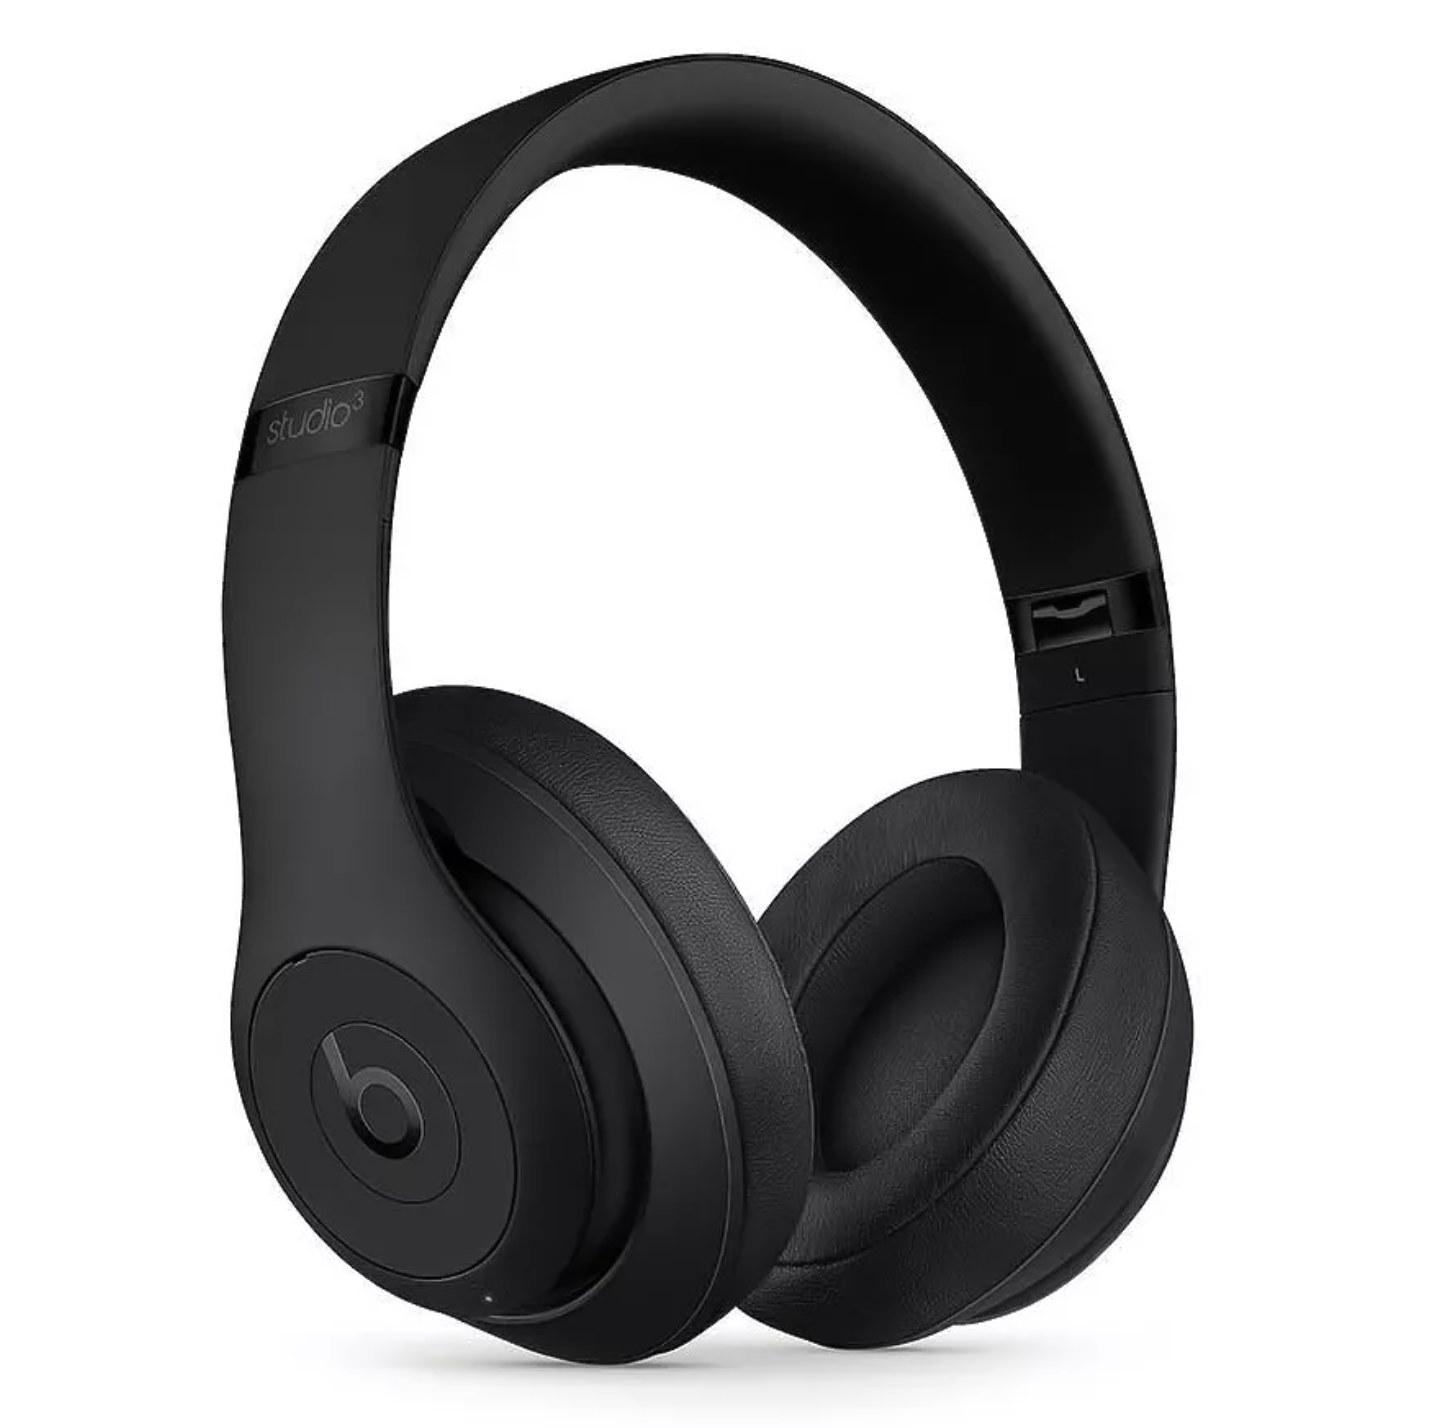 Black Beats Society3 over the ear noise-canceling headphones